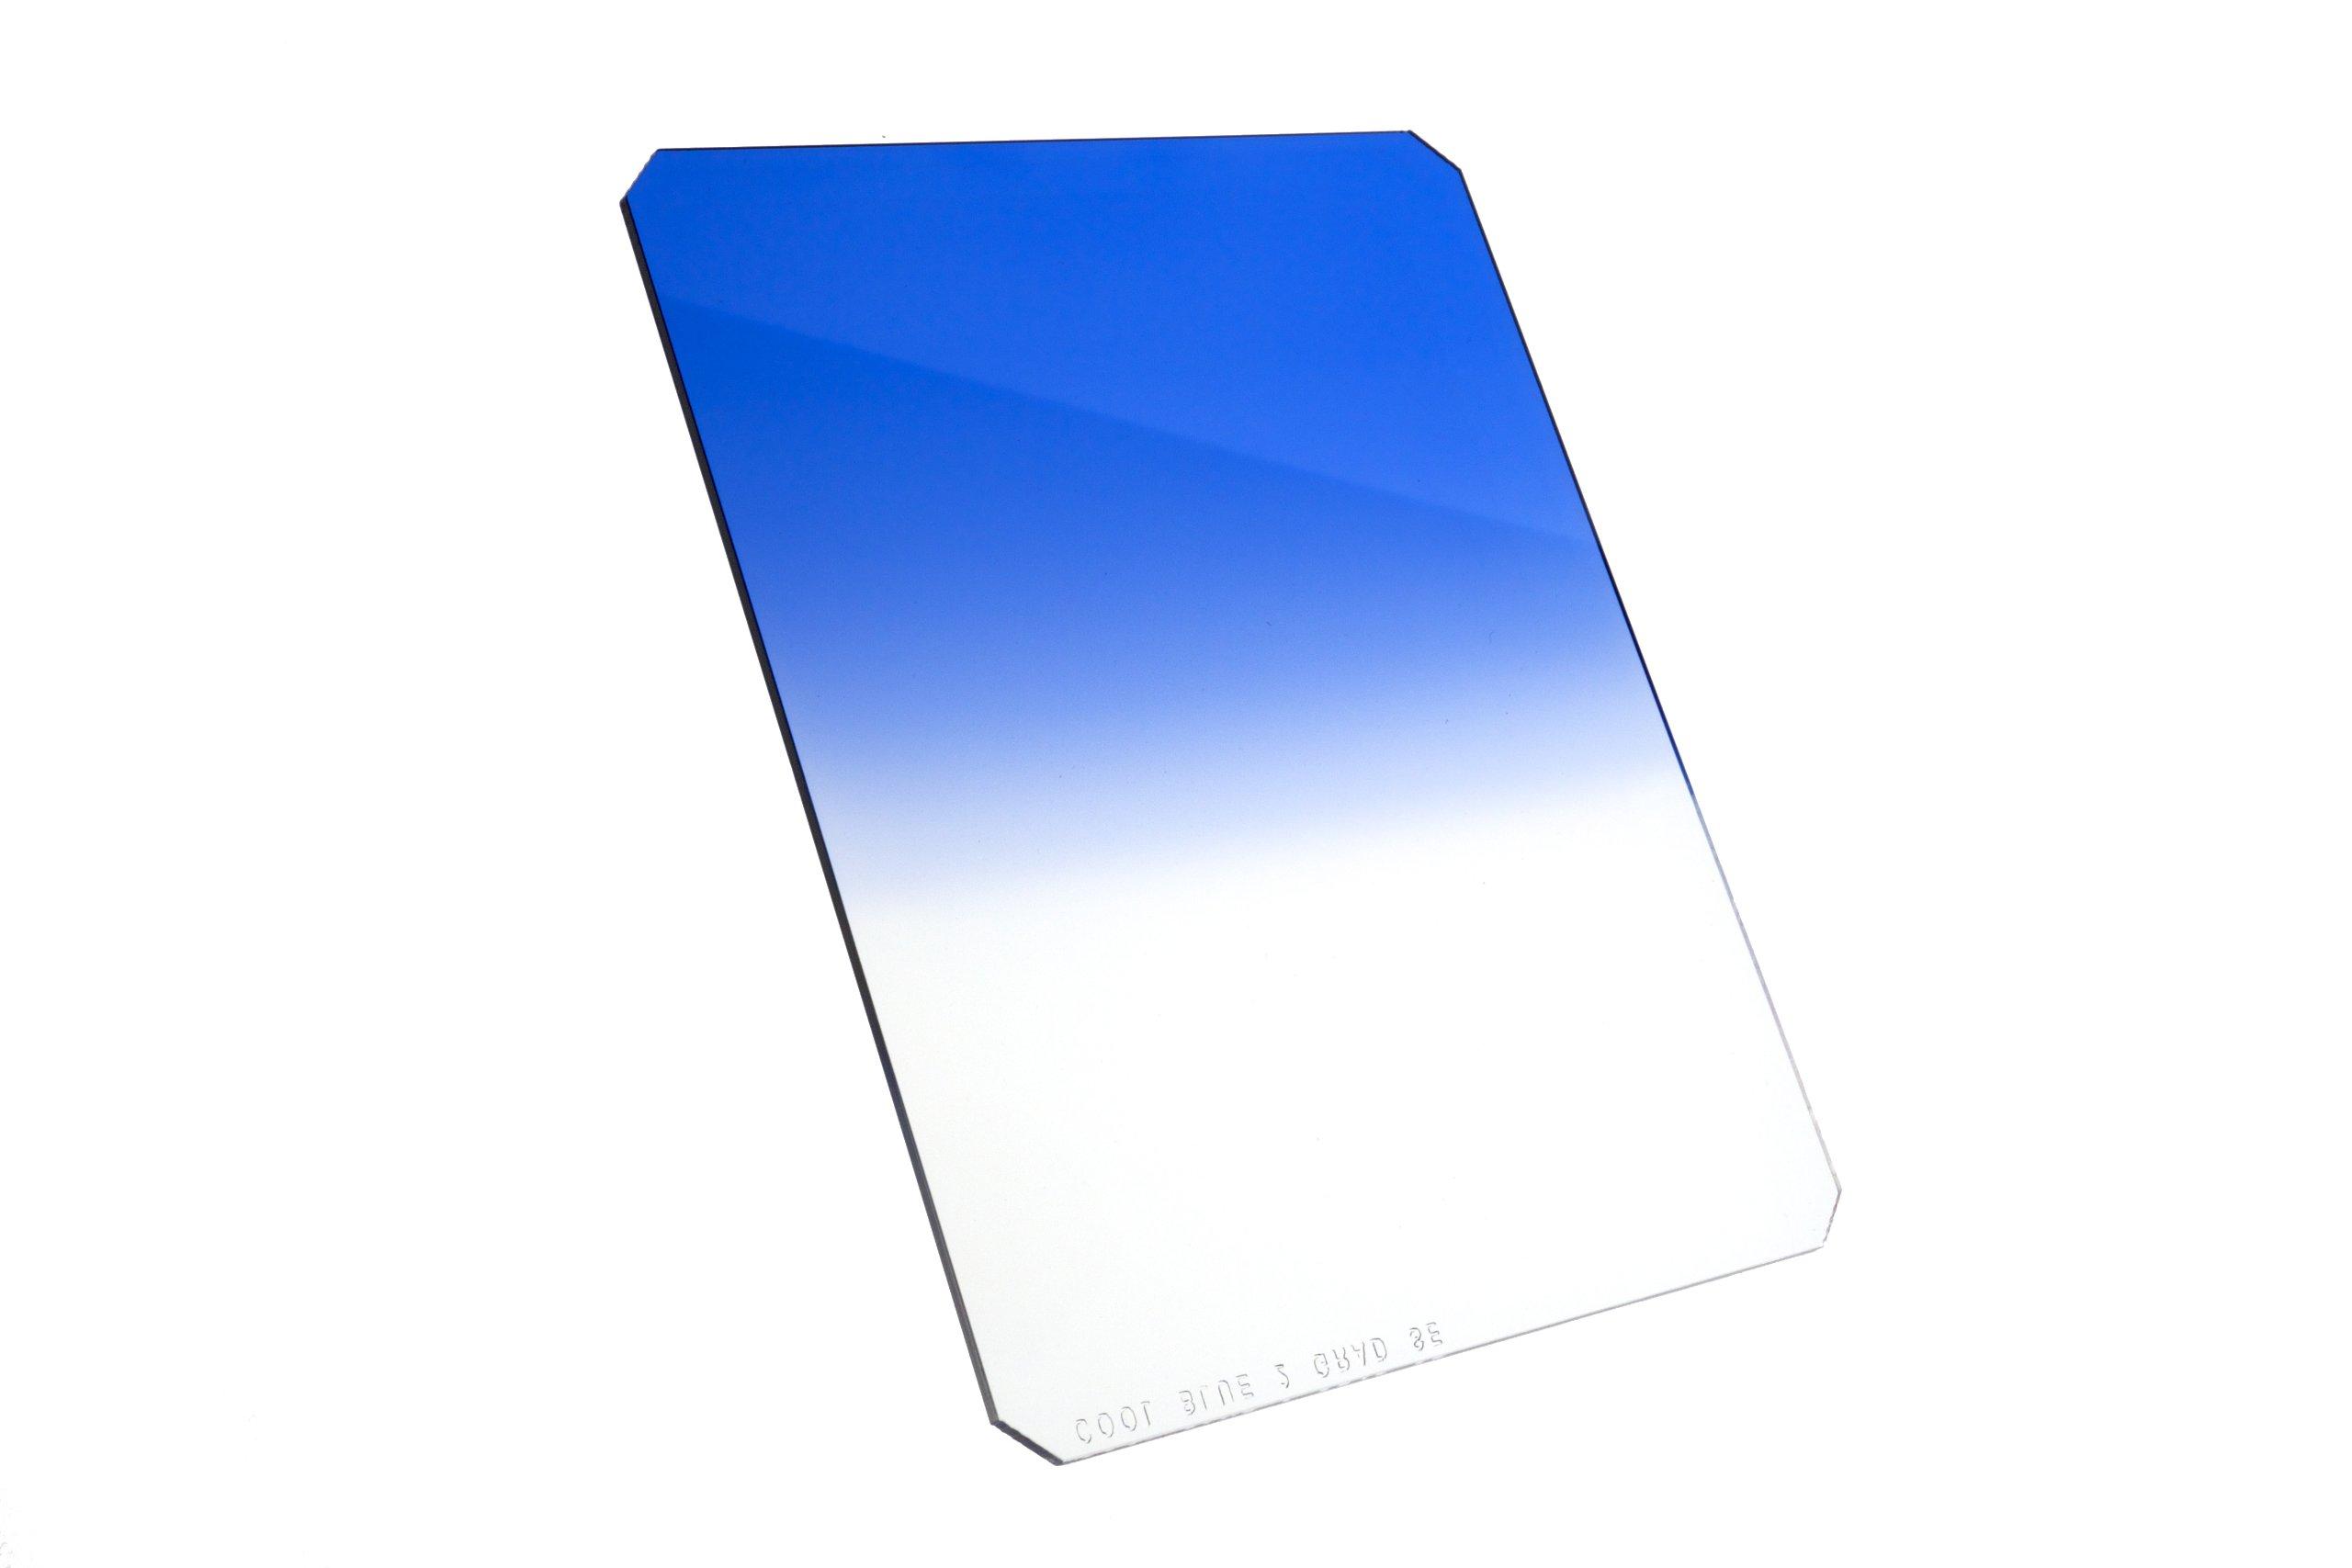 Resin Color Grad Soft Edge Blue 3 Formatt-Hitech 100x150mm 4x6